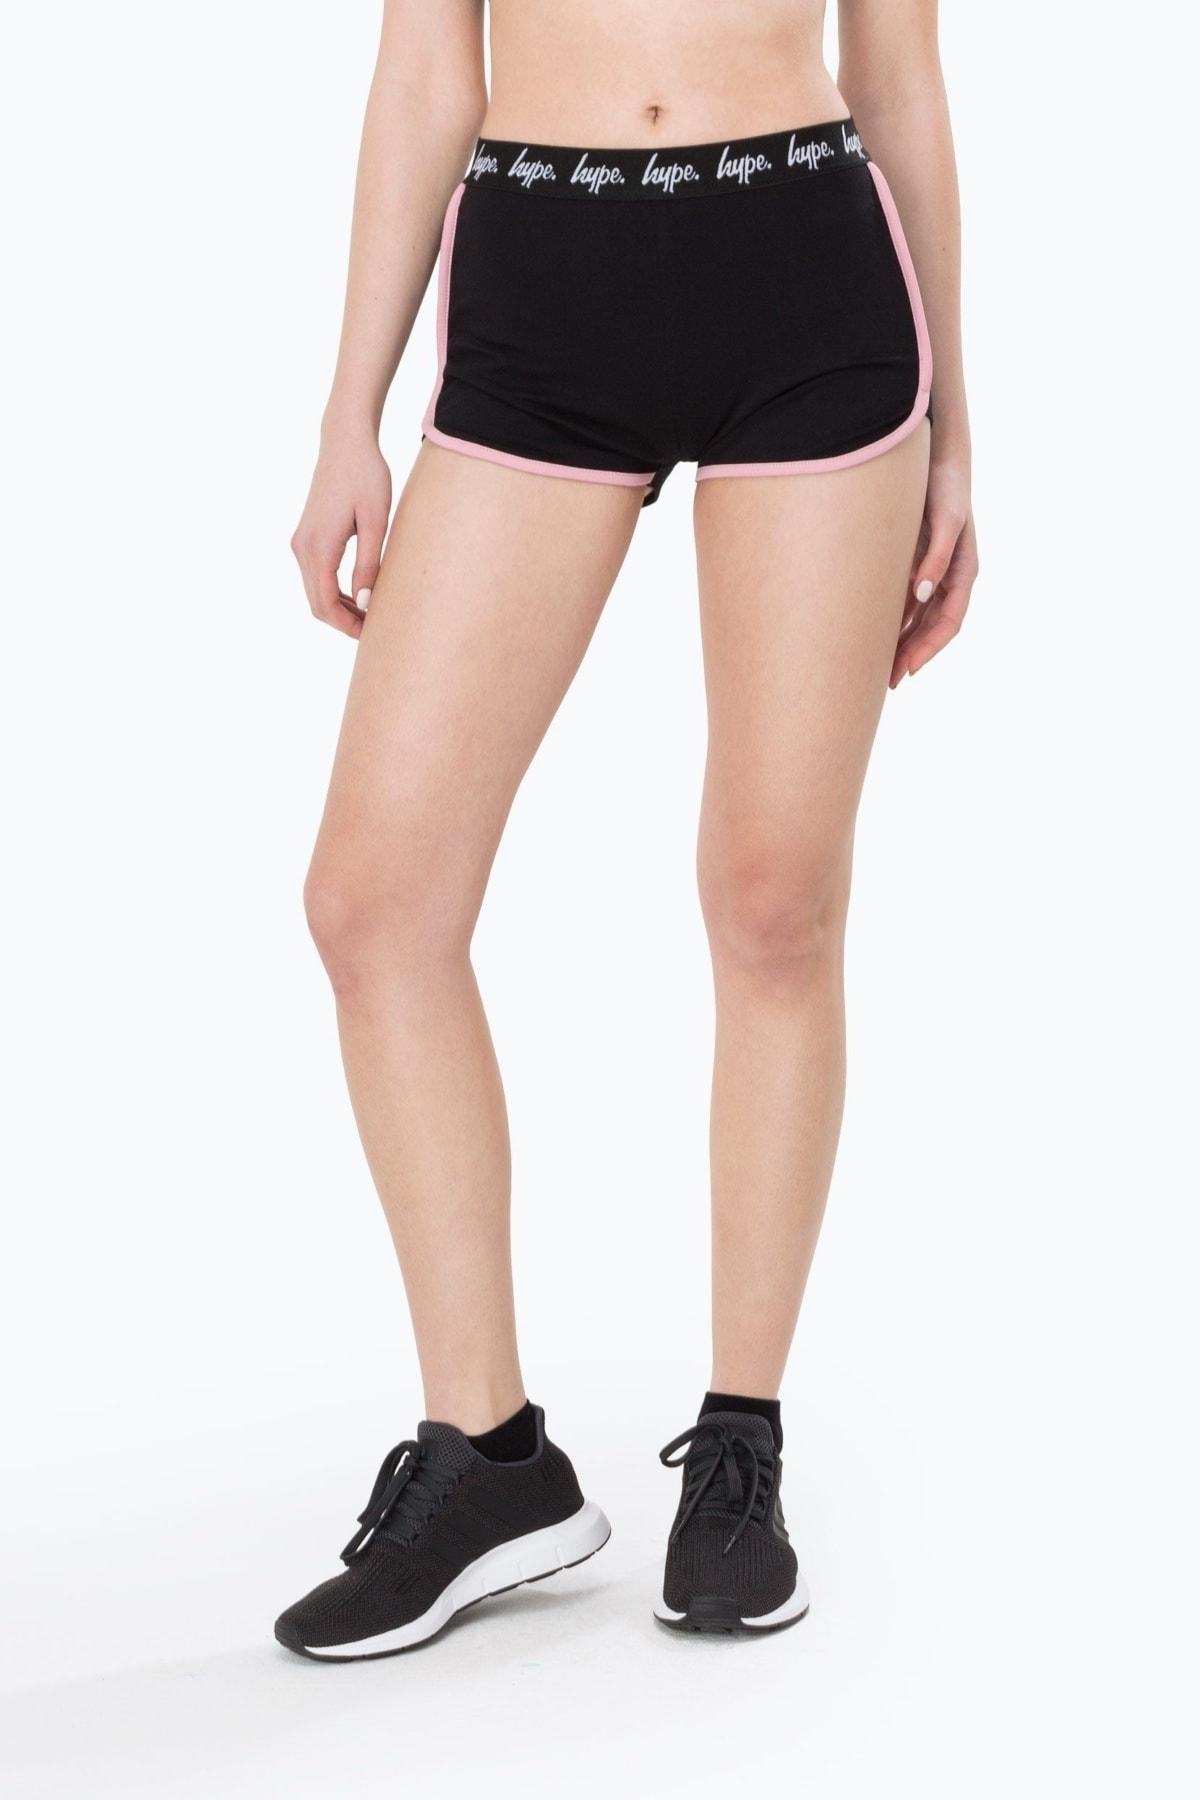 HYPE Black/Pink Running Women's Shorts